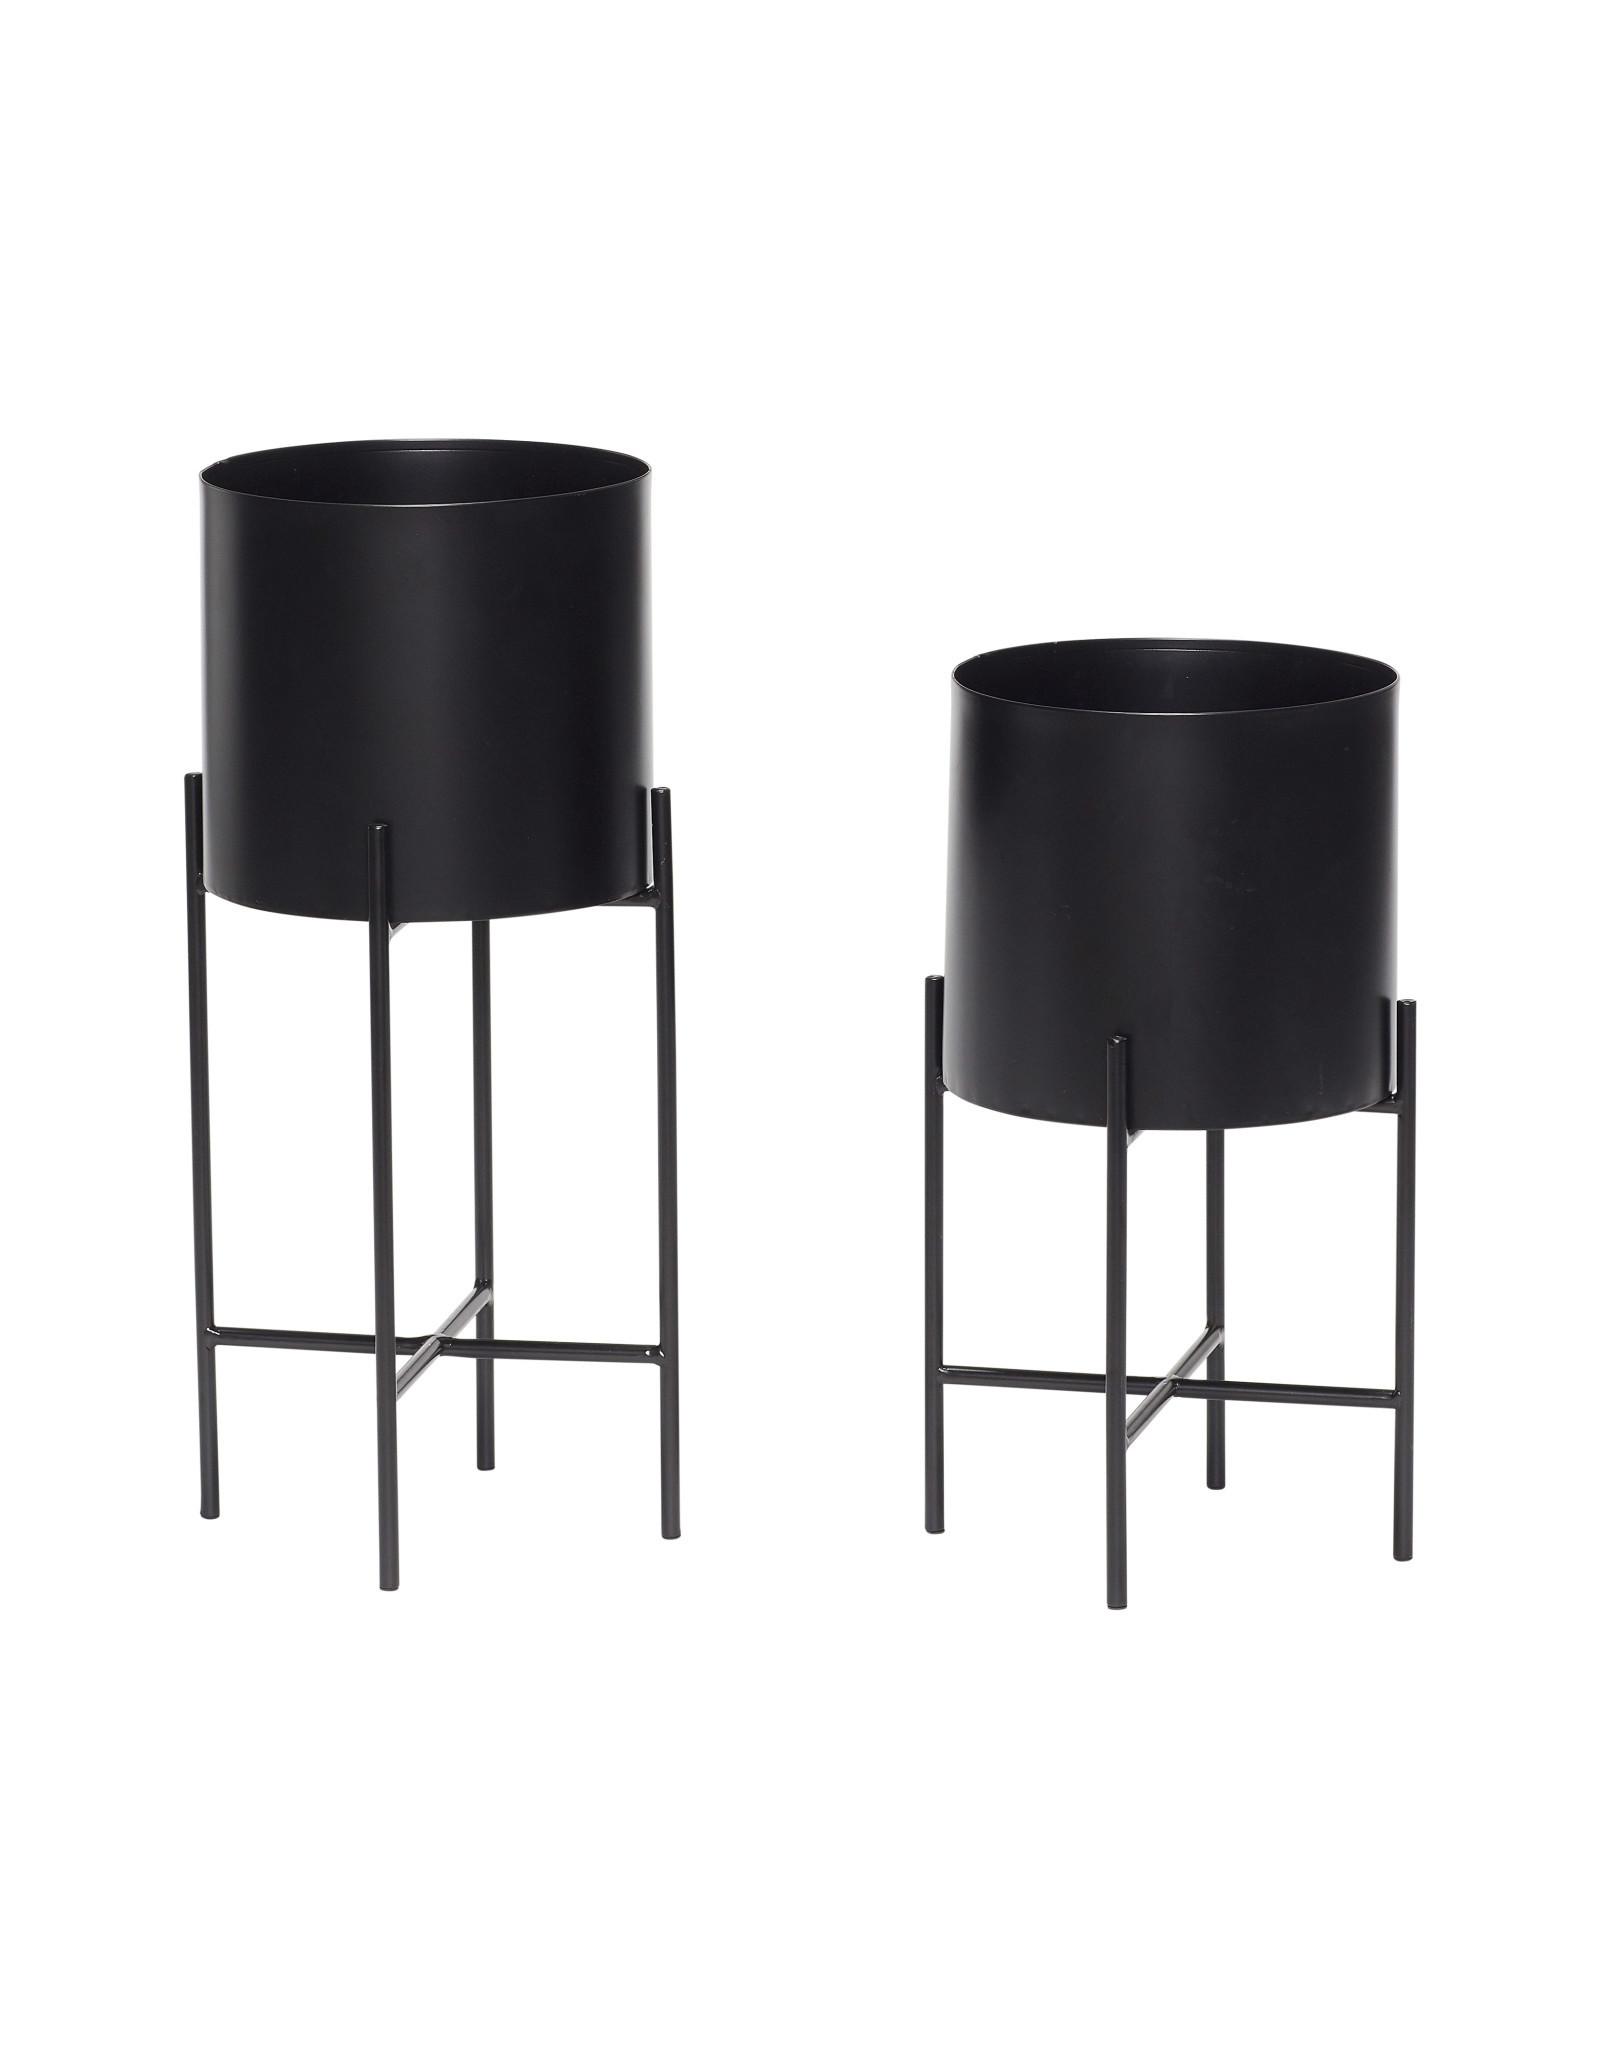 Hübsch Black Pot w/ legs ø23xh55